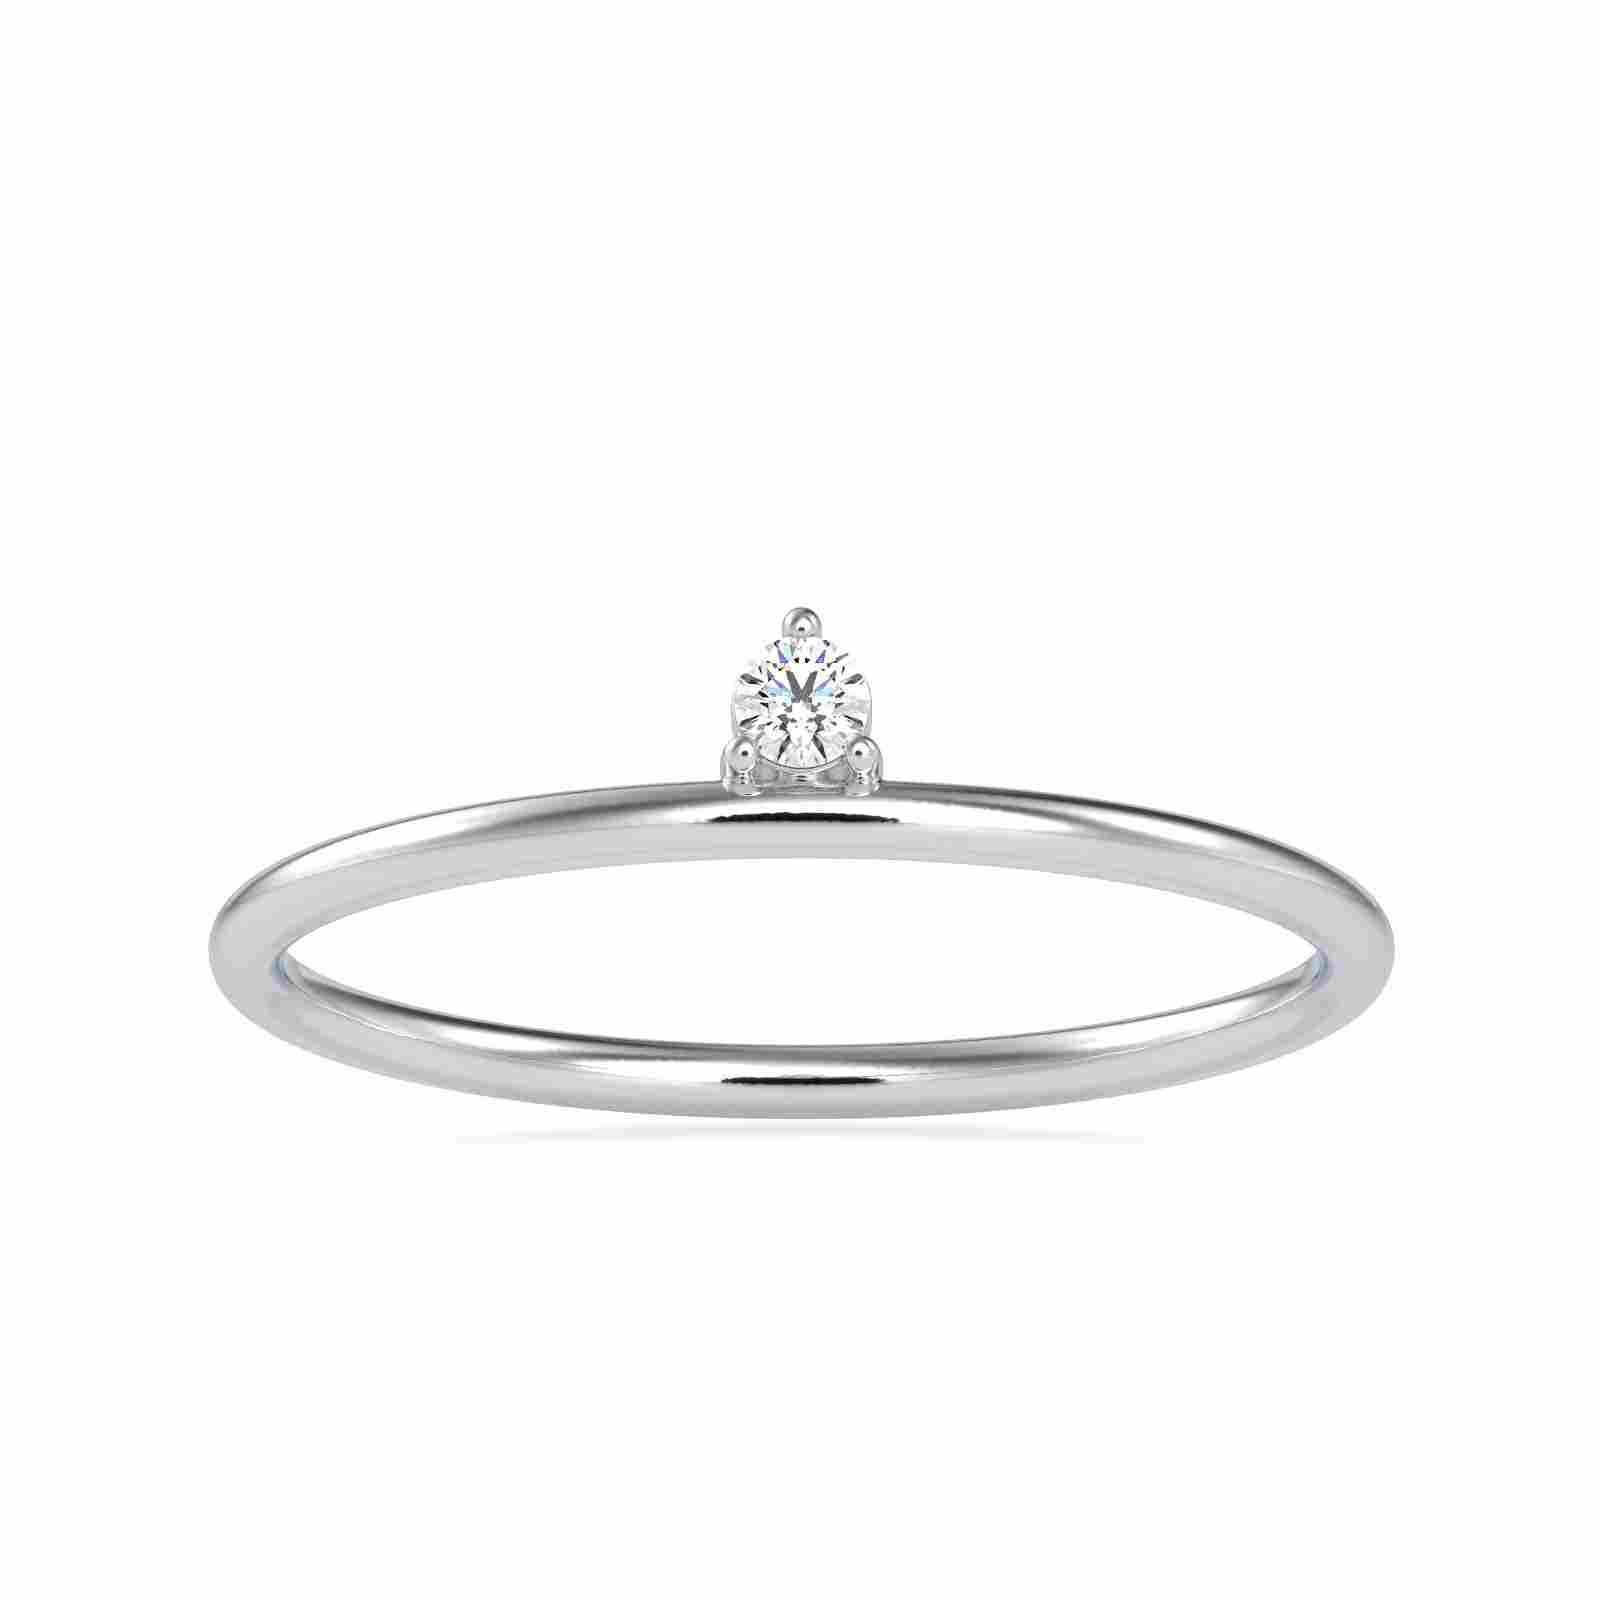 0.04CT Natural Diamond 14K White Gold Ring